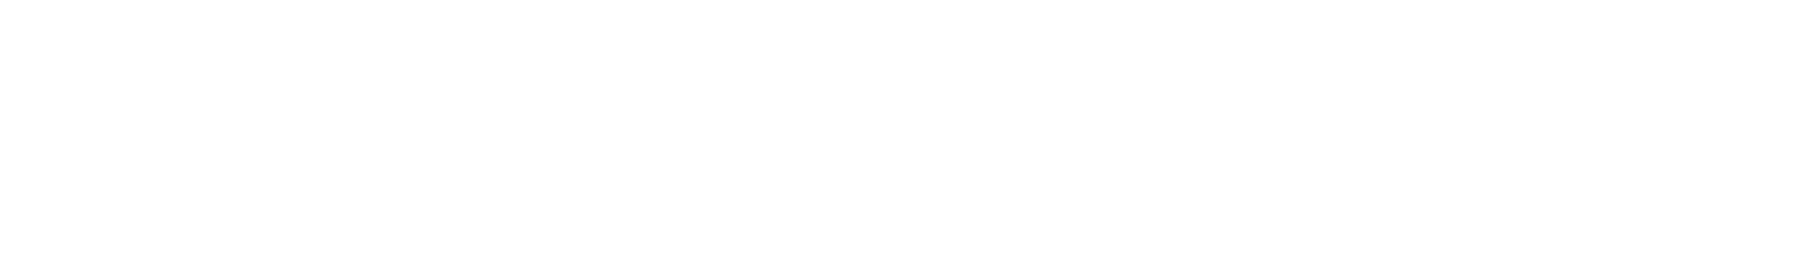 vedh melodyloop 078 fm9 cm9 am9 124bpm